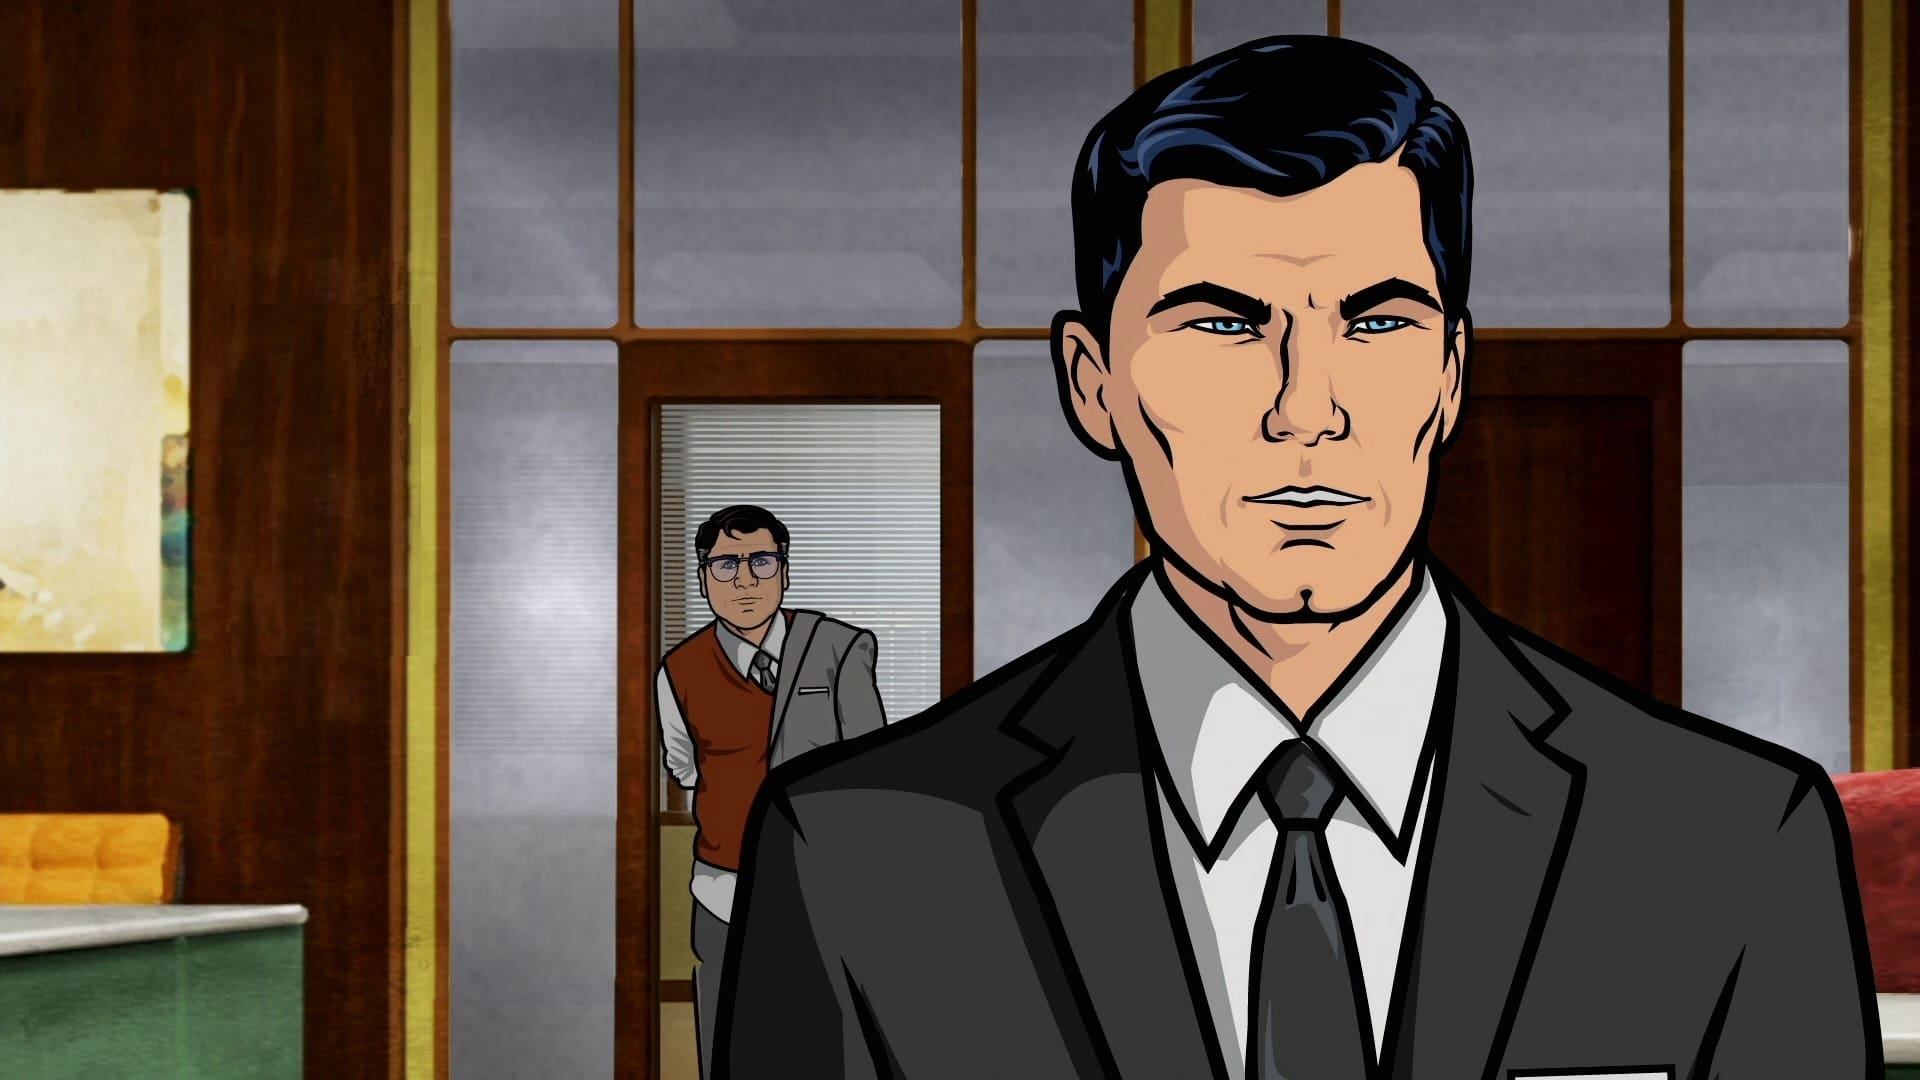 Archer Season 1 Episode 1 Openload Watch Online Full Episode Free Tv Show